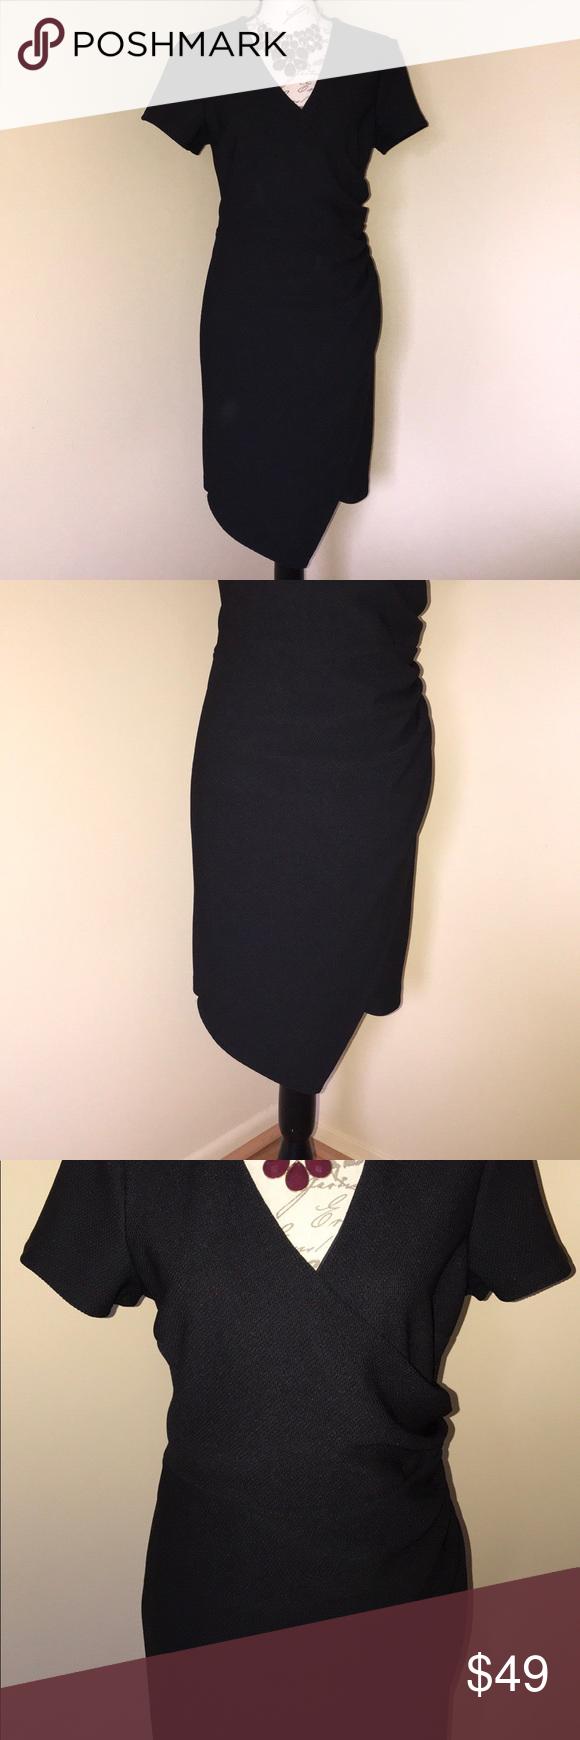 Womenus black dress spandex fabric black party and polyester spandex